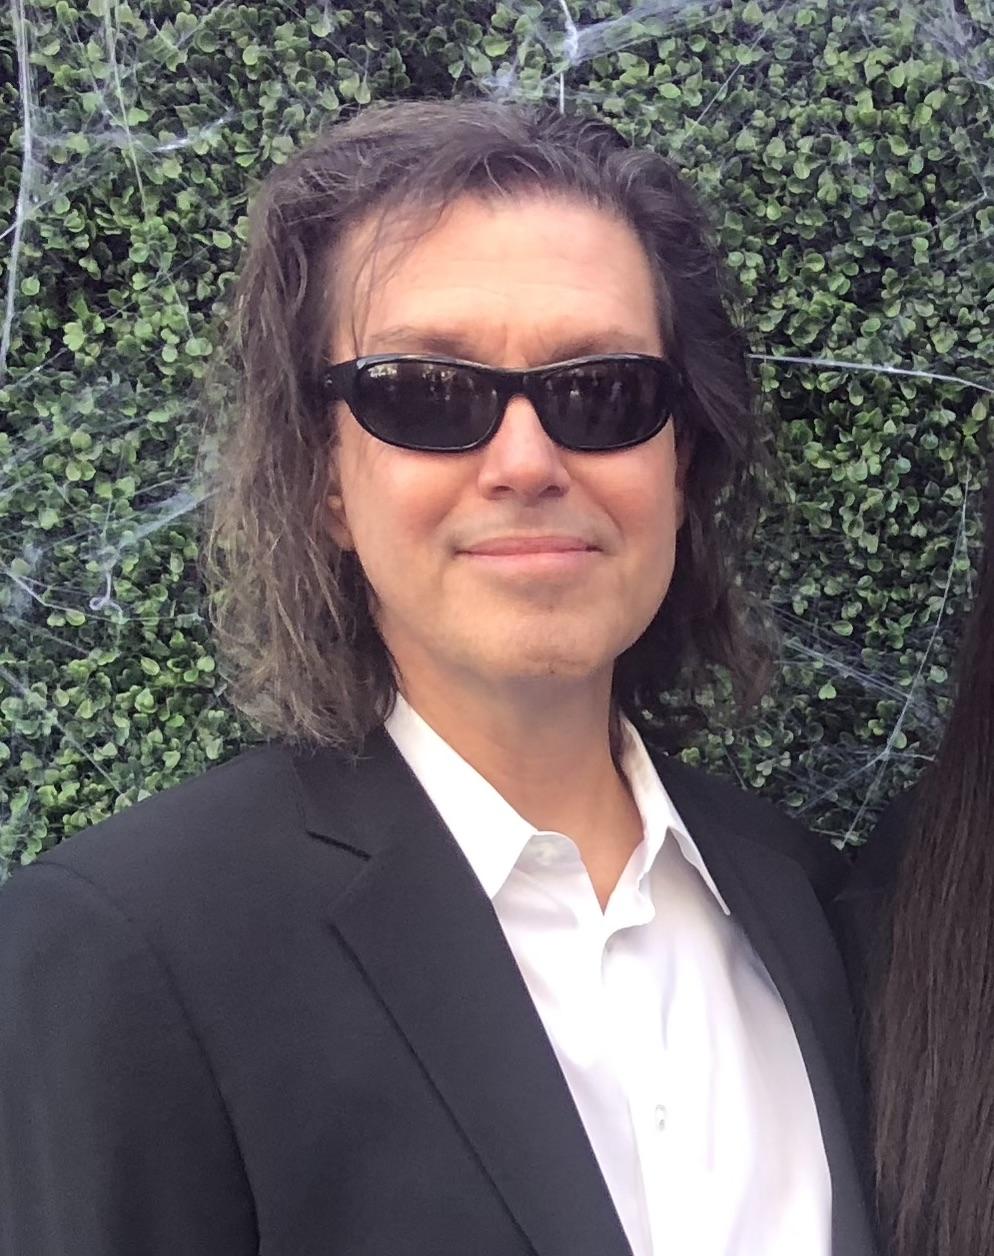 Michael Marcantel